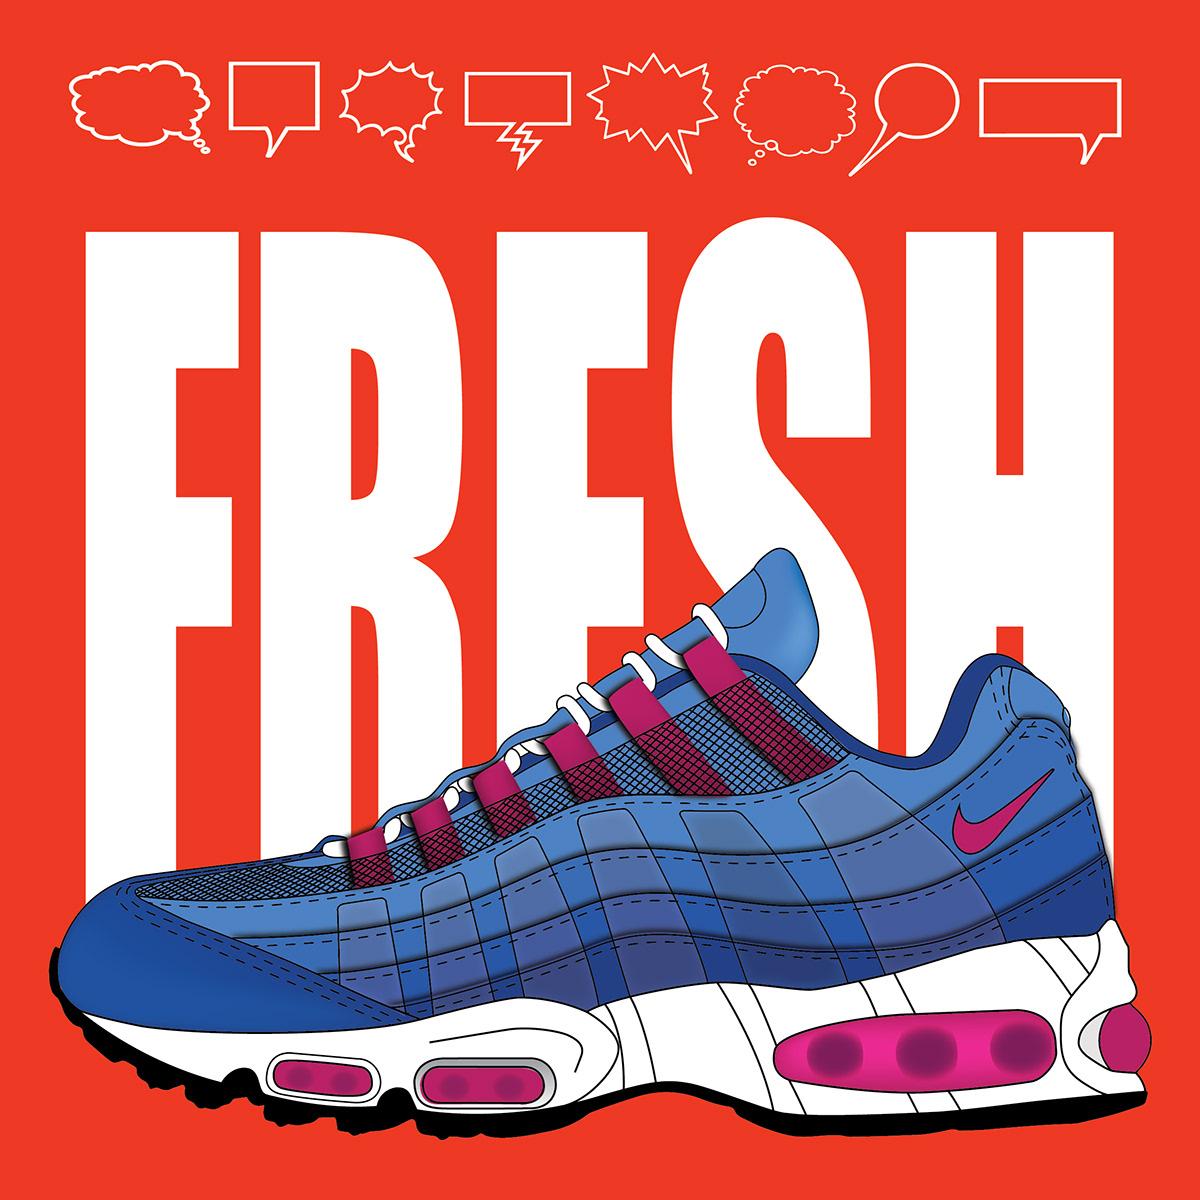 sneakers Nike air max fresh ILLUSTRATION  Illustrator